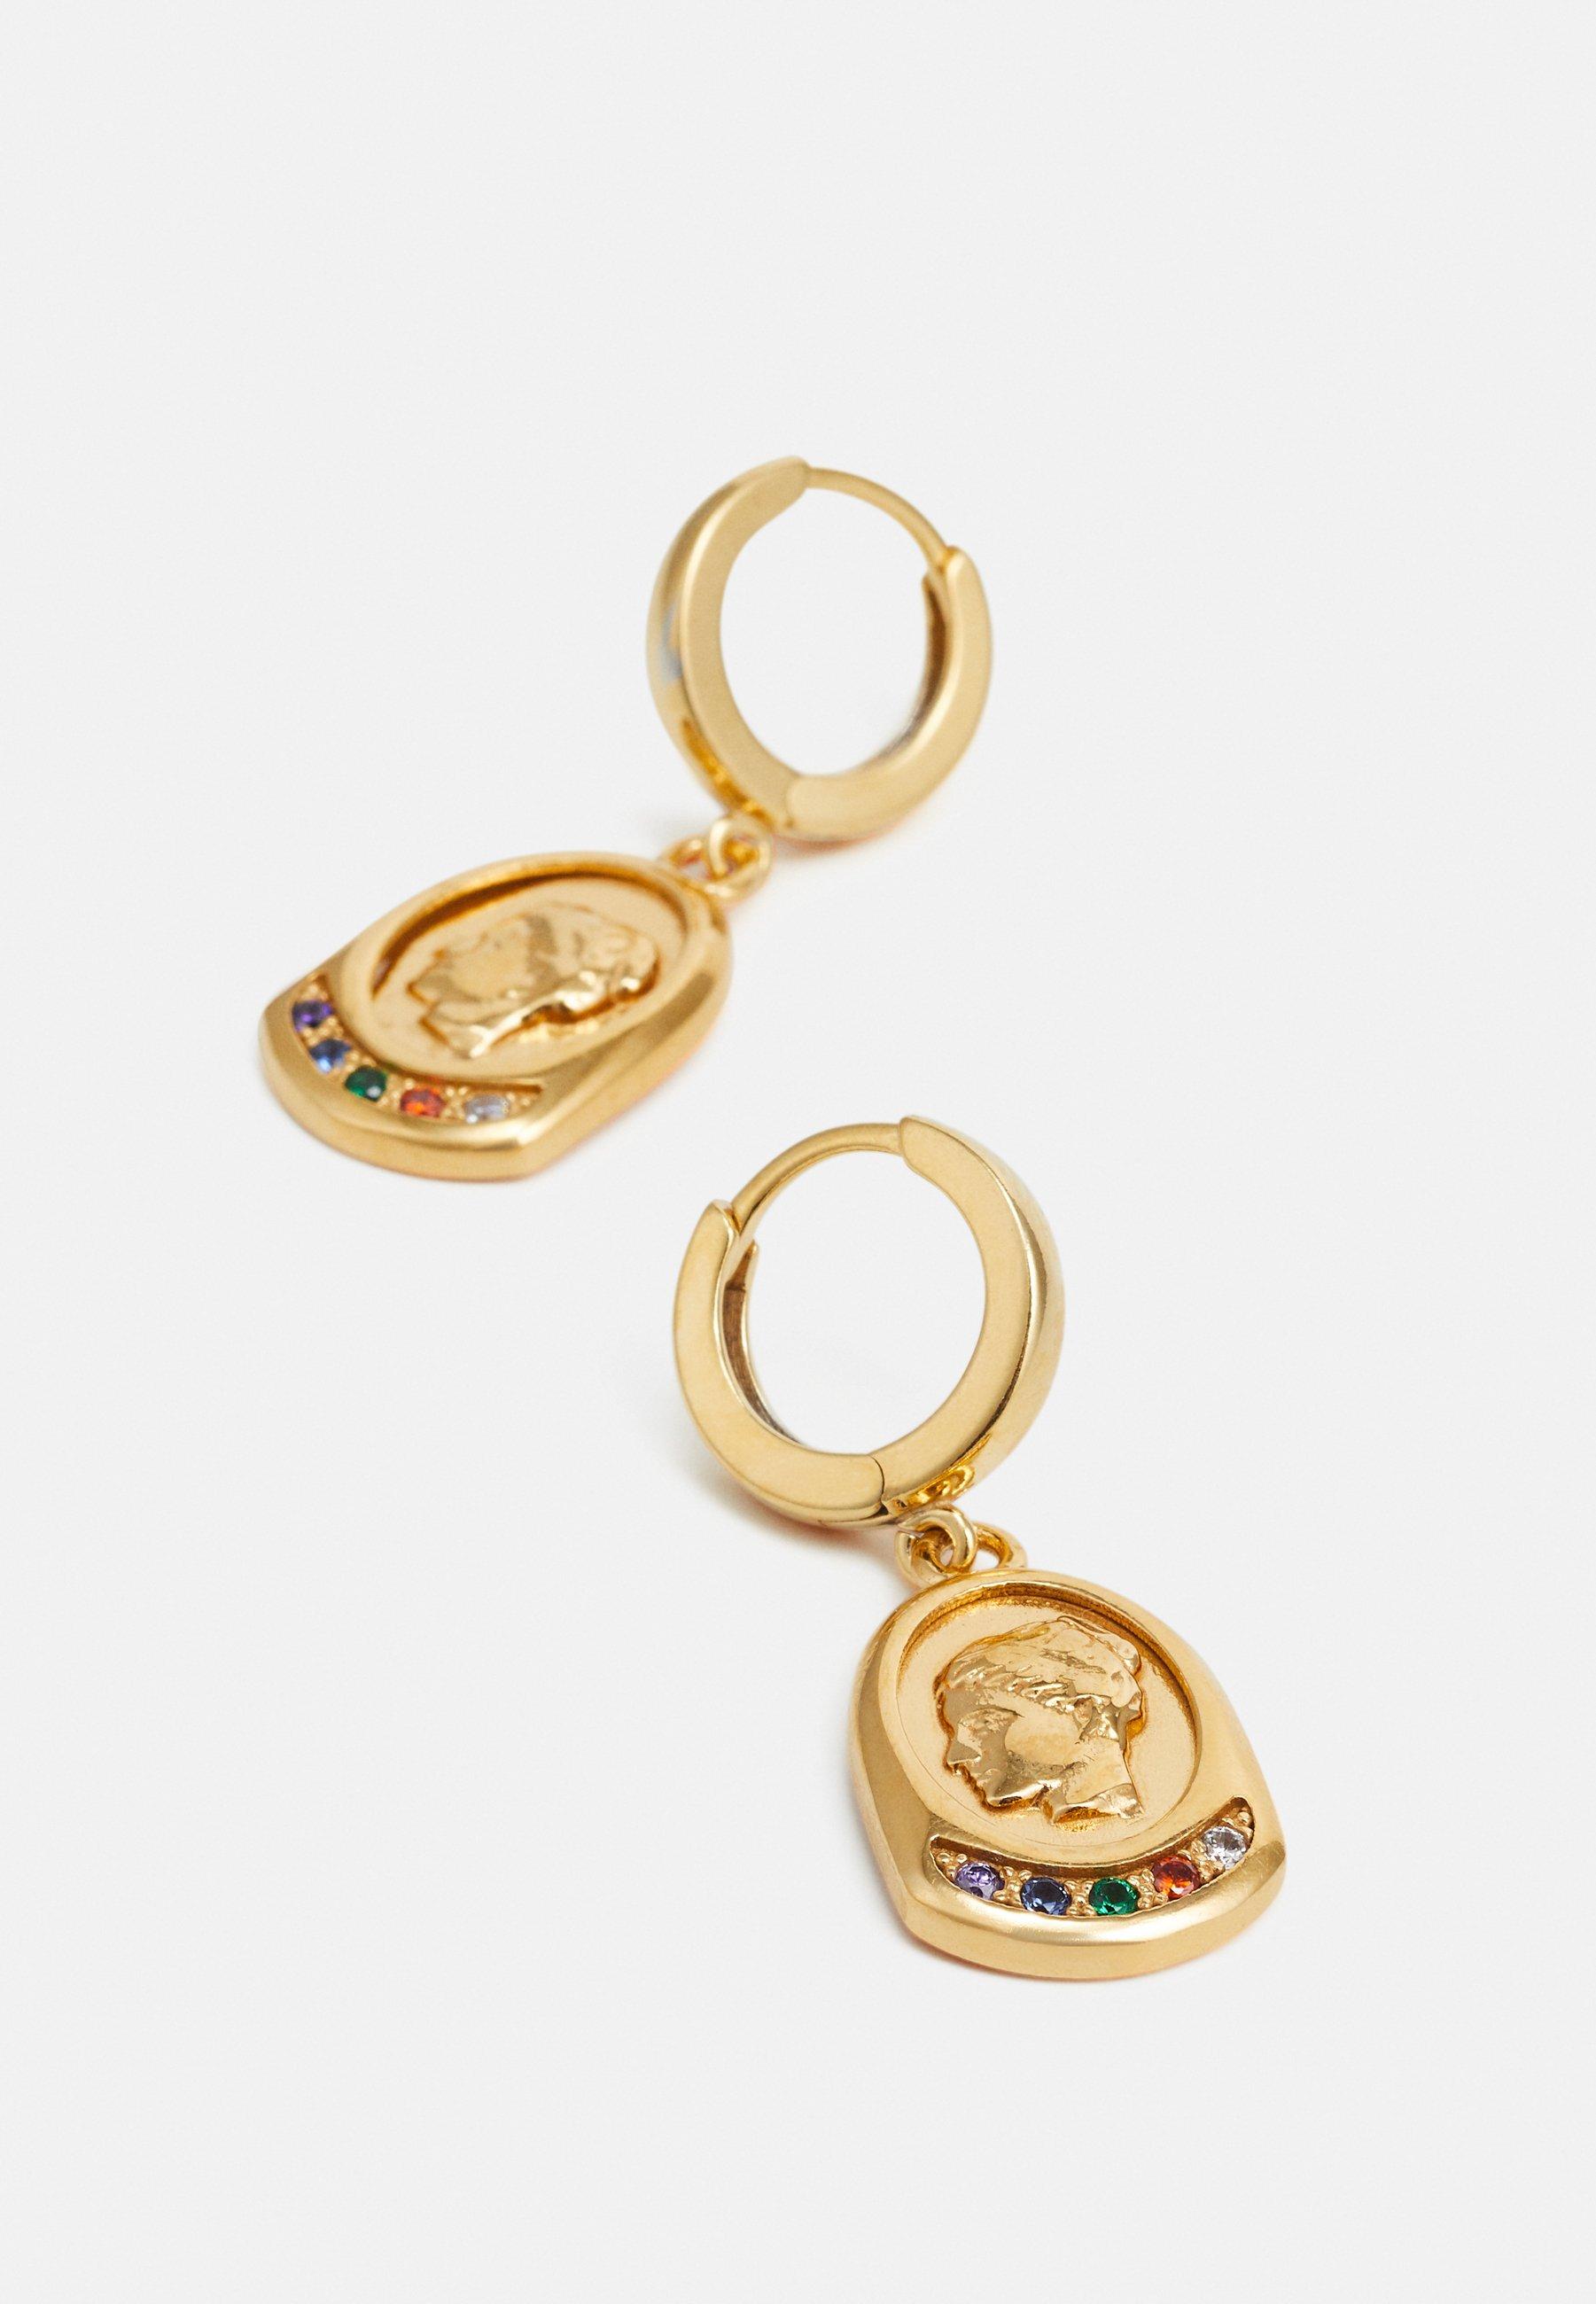 Hermina Athens Ygieia Slip On Earrings - Ohrringe Gold-coloured/multi/gold